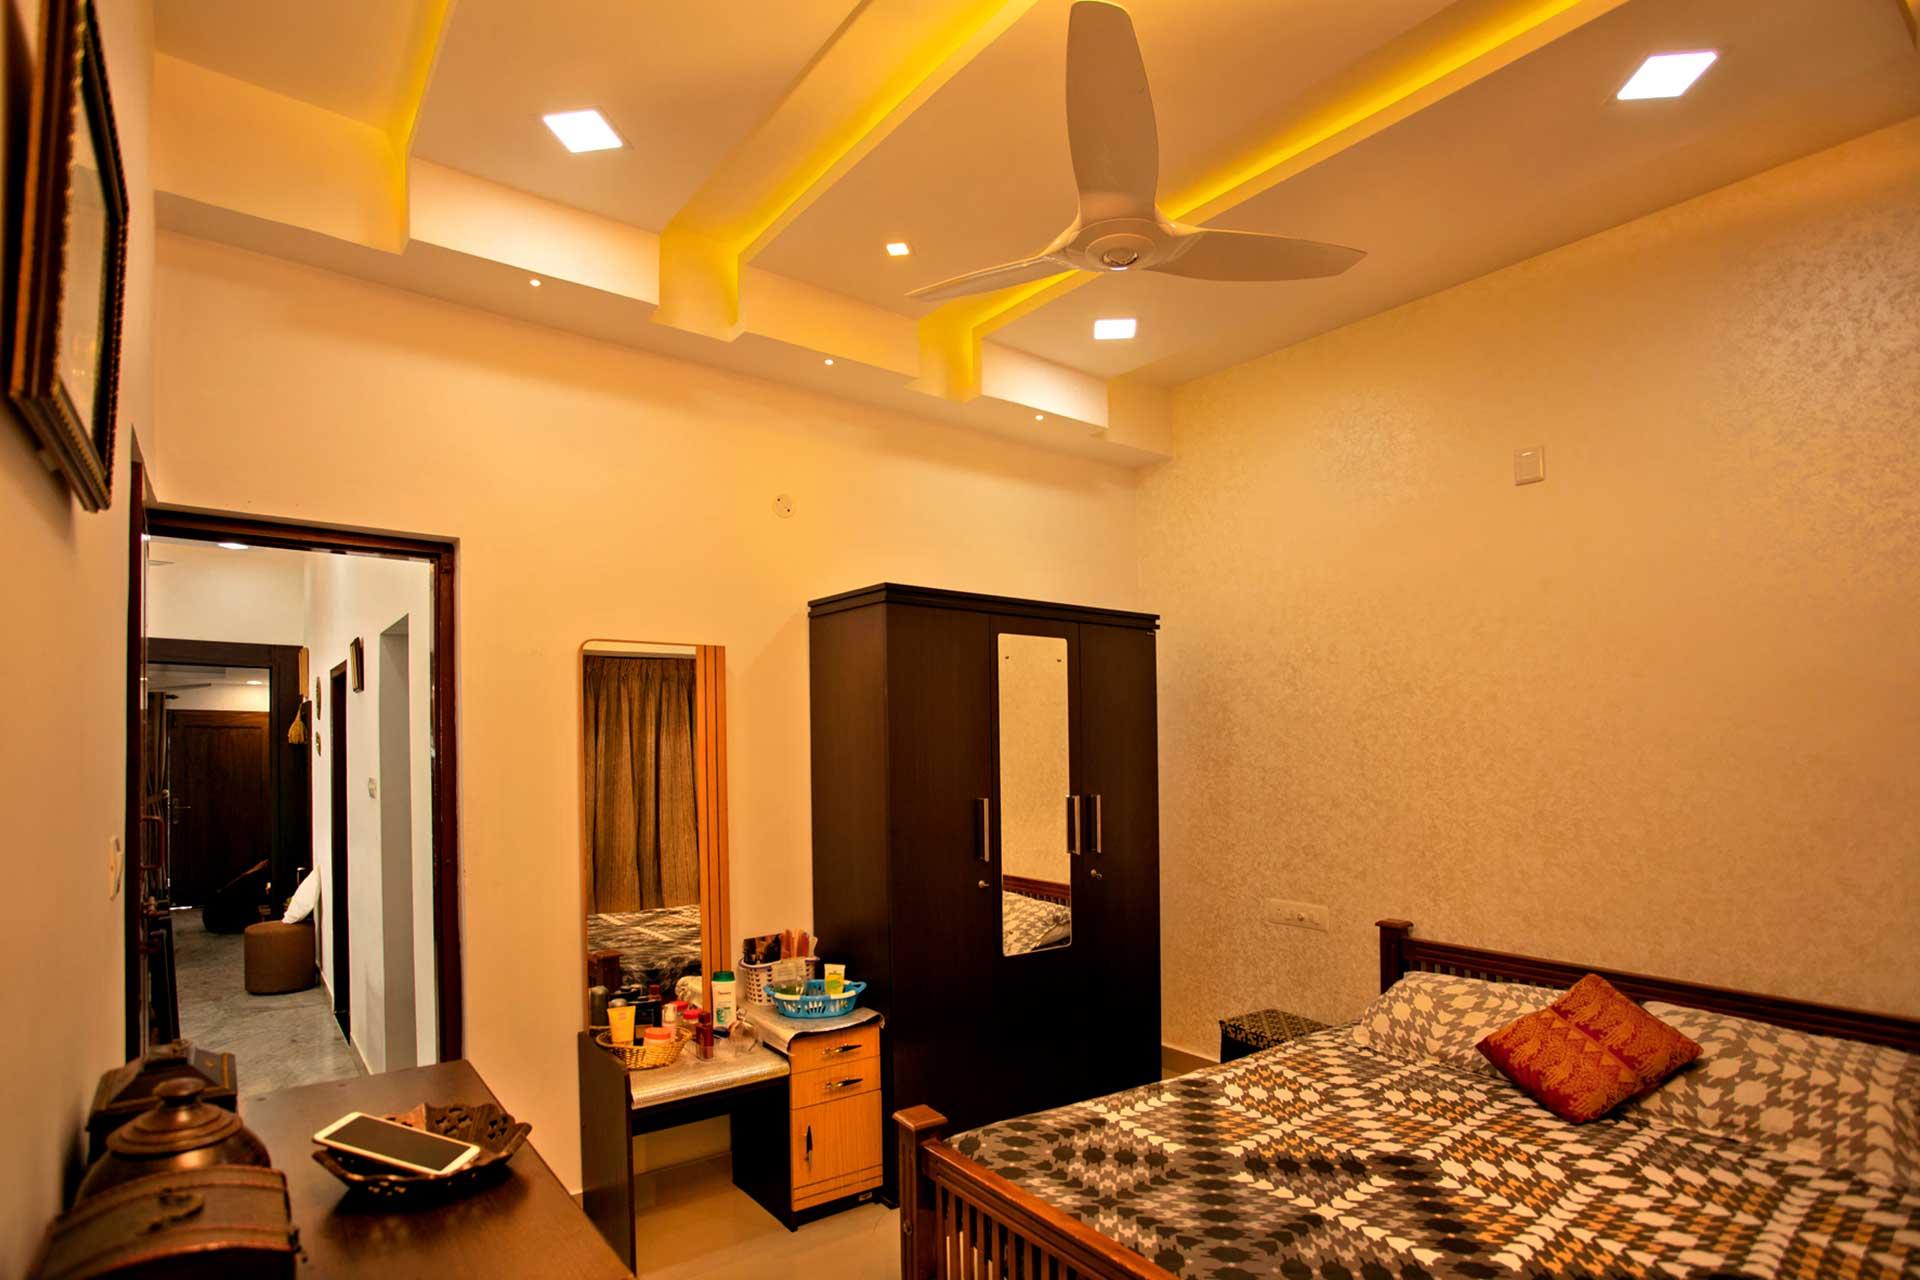 Bedroom interior design3